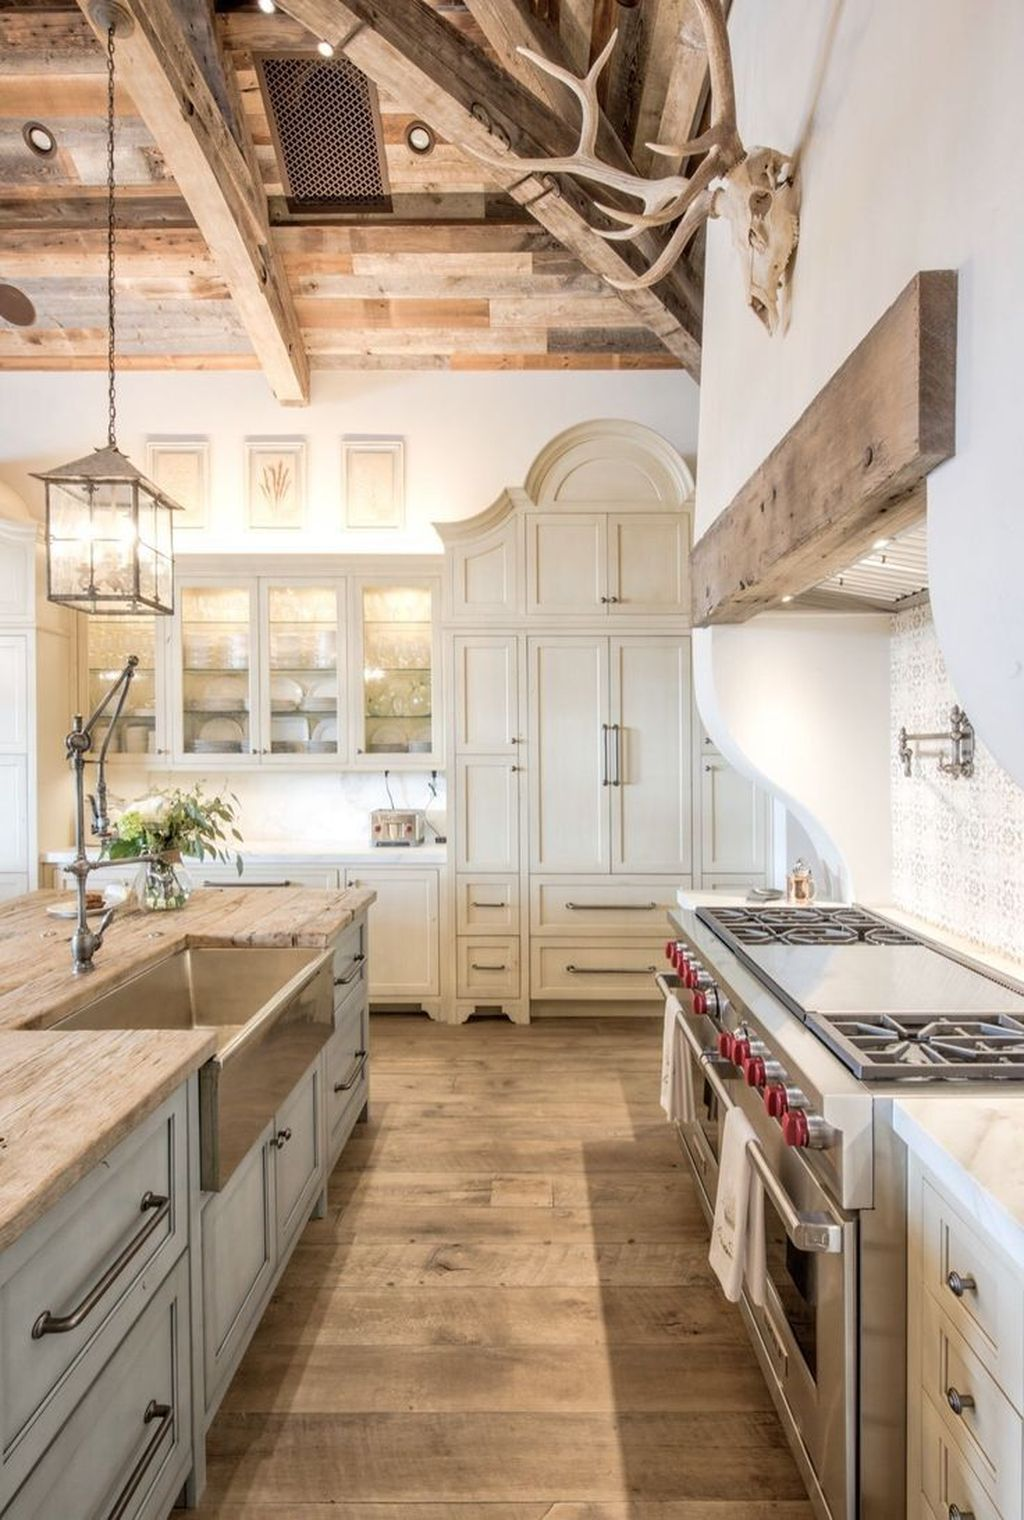 Stunning Farmhouse Interior Design Ideas To Realize Your Dreams 20